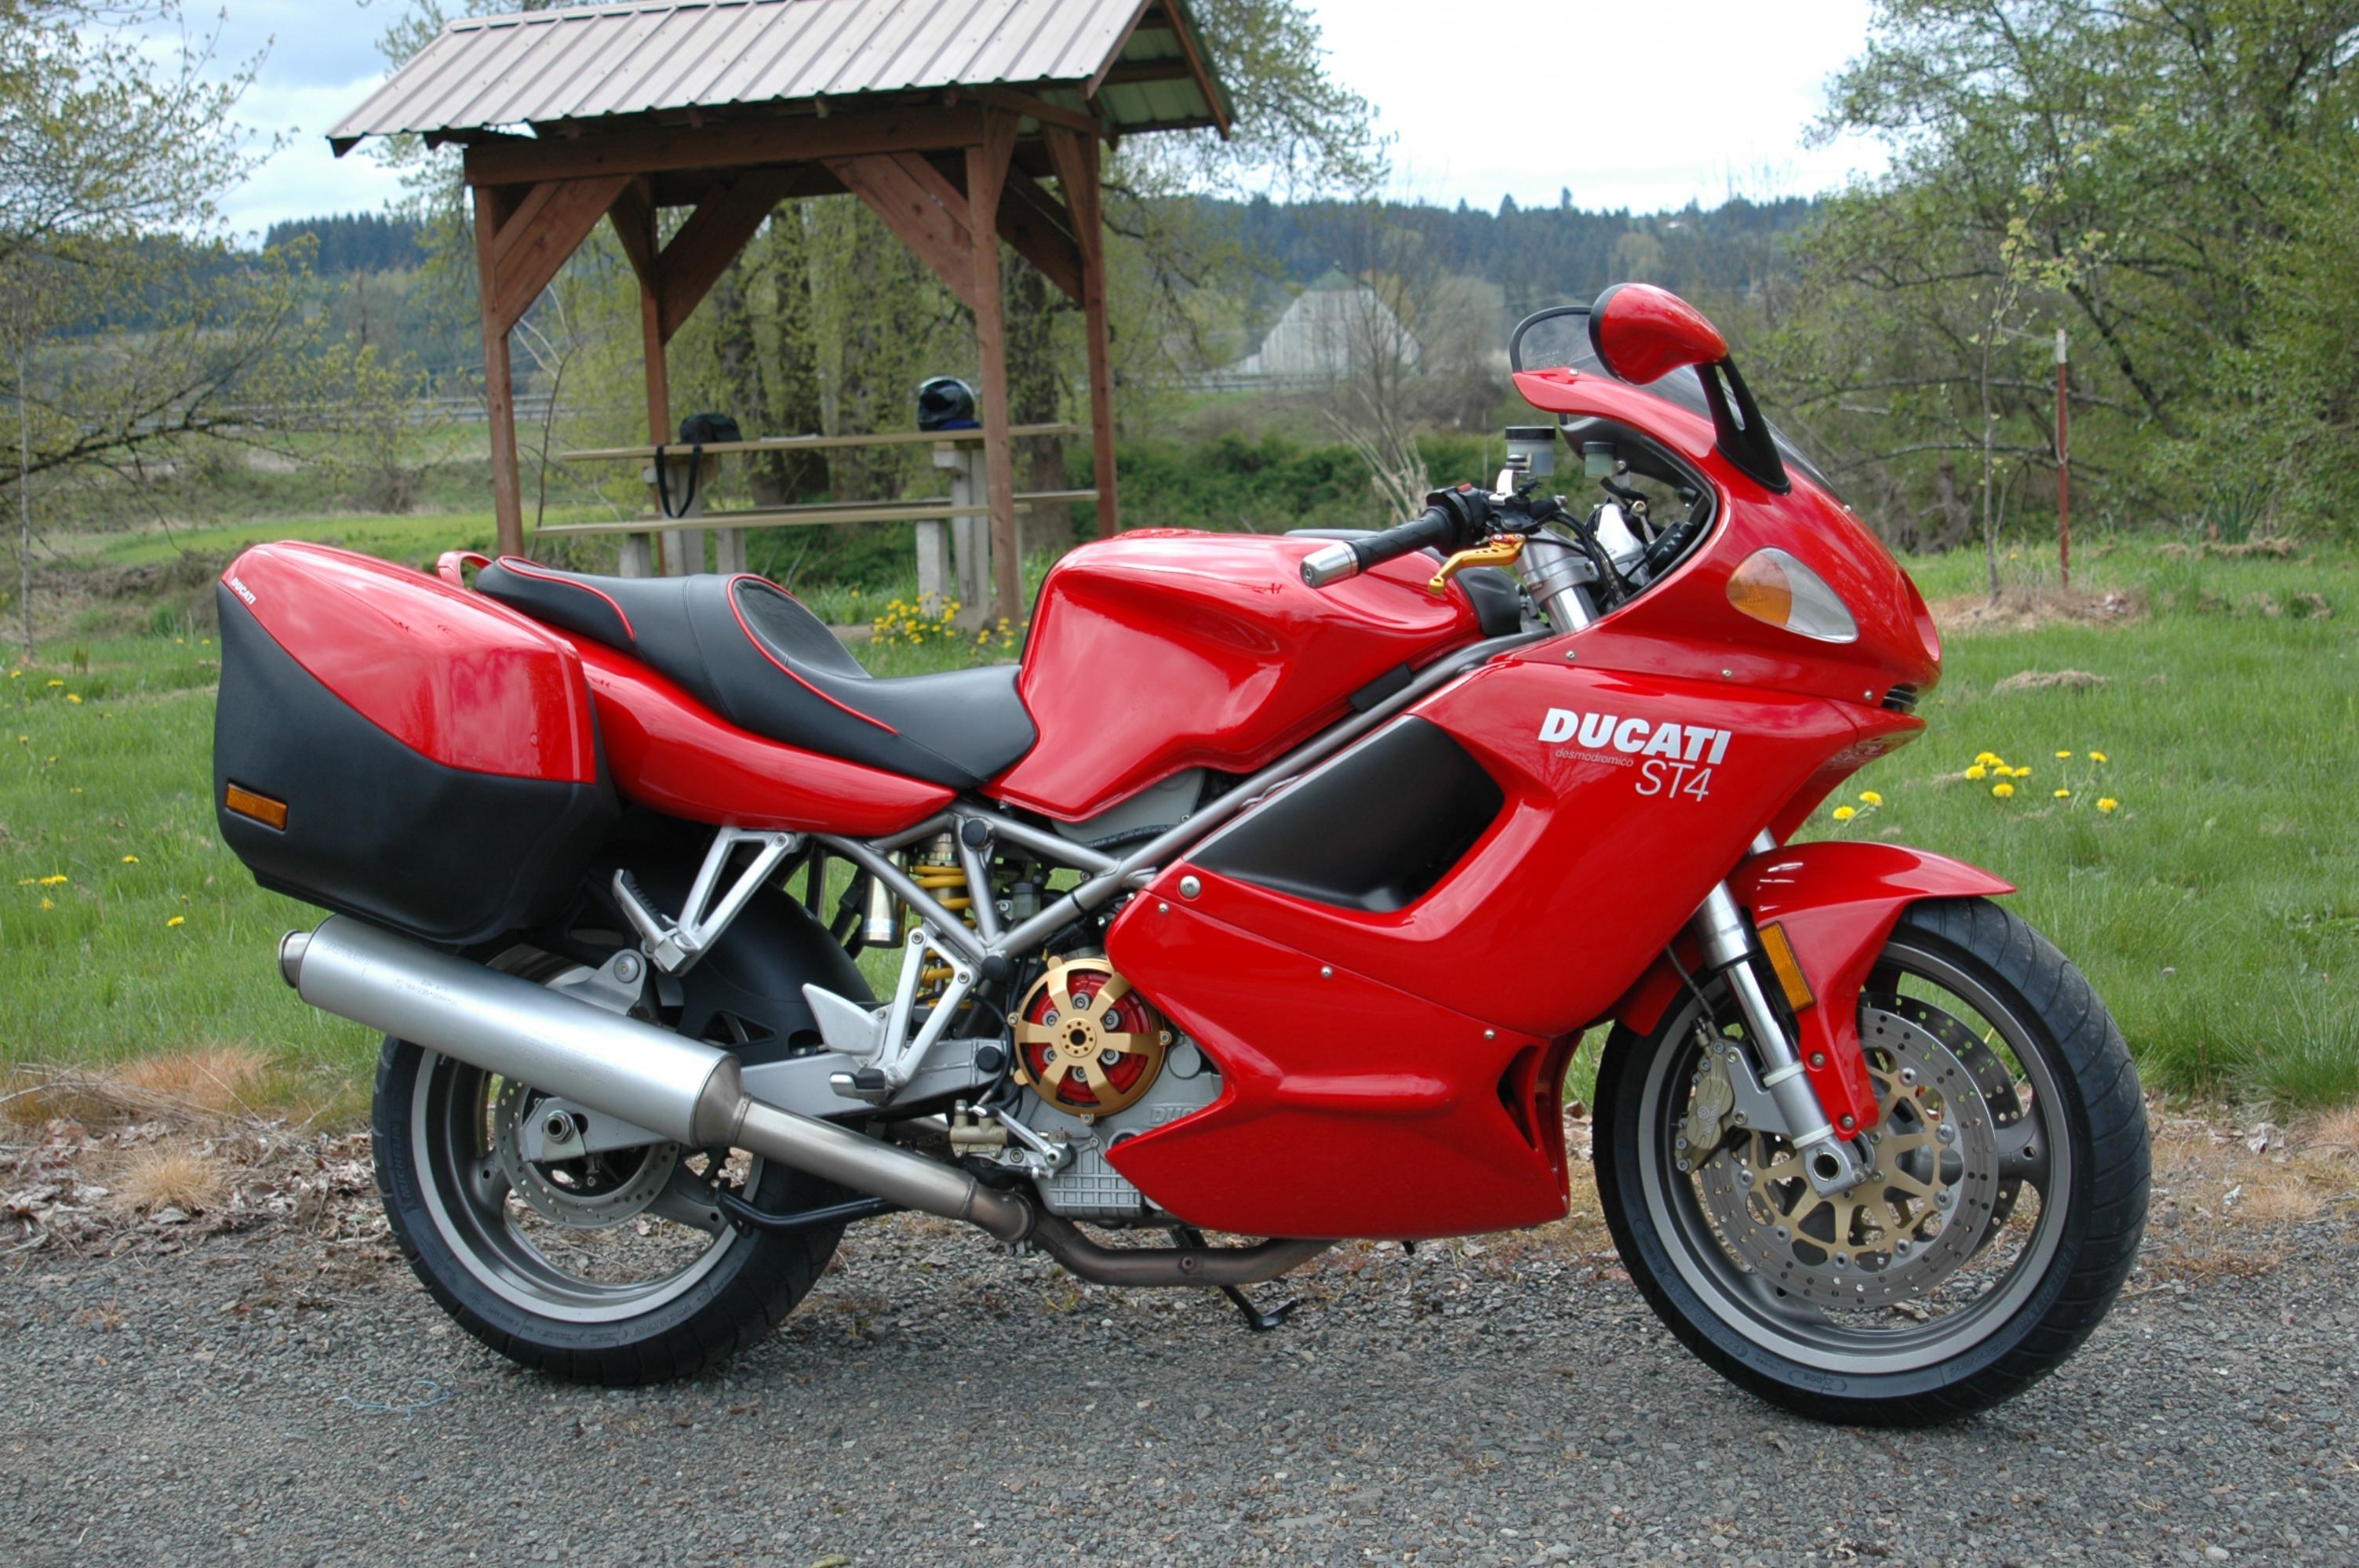 2001 ducati st4 - for sale - $4,000 - ducati.ms - the ultimate